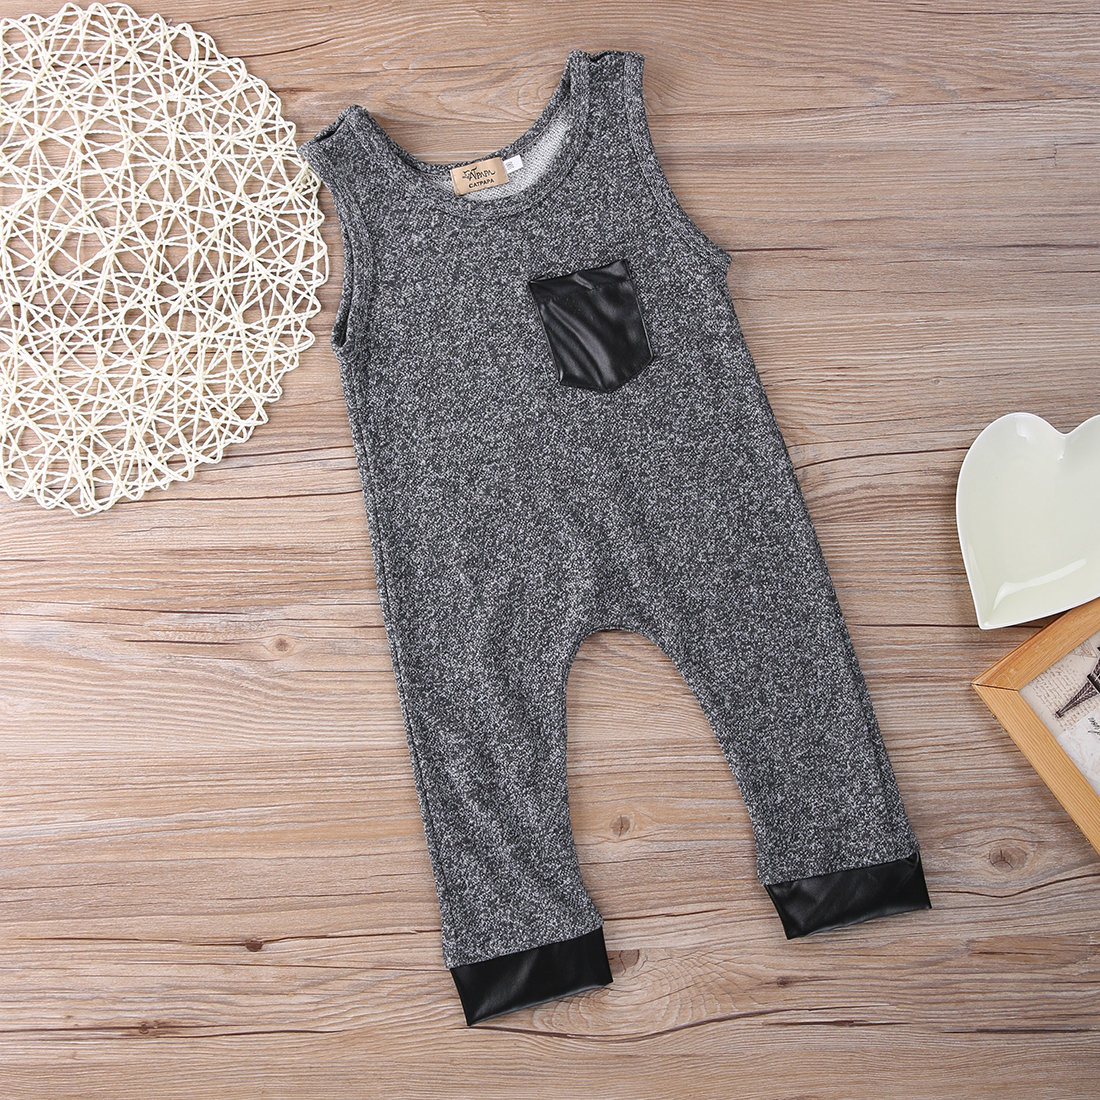 Toddler Baby Girls Boy Organic Romper Bib Playsuit Outfits Clothes 1-6Y erbaviva organic cotton baby bib